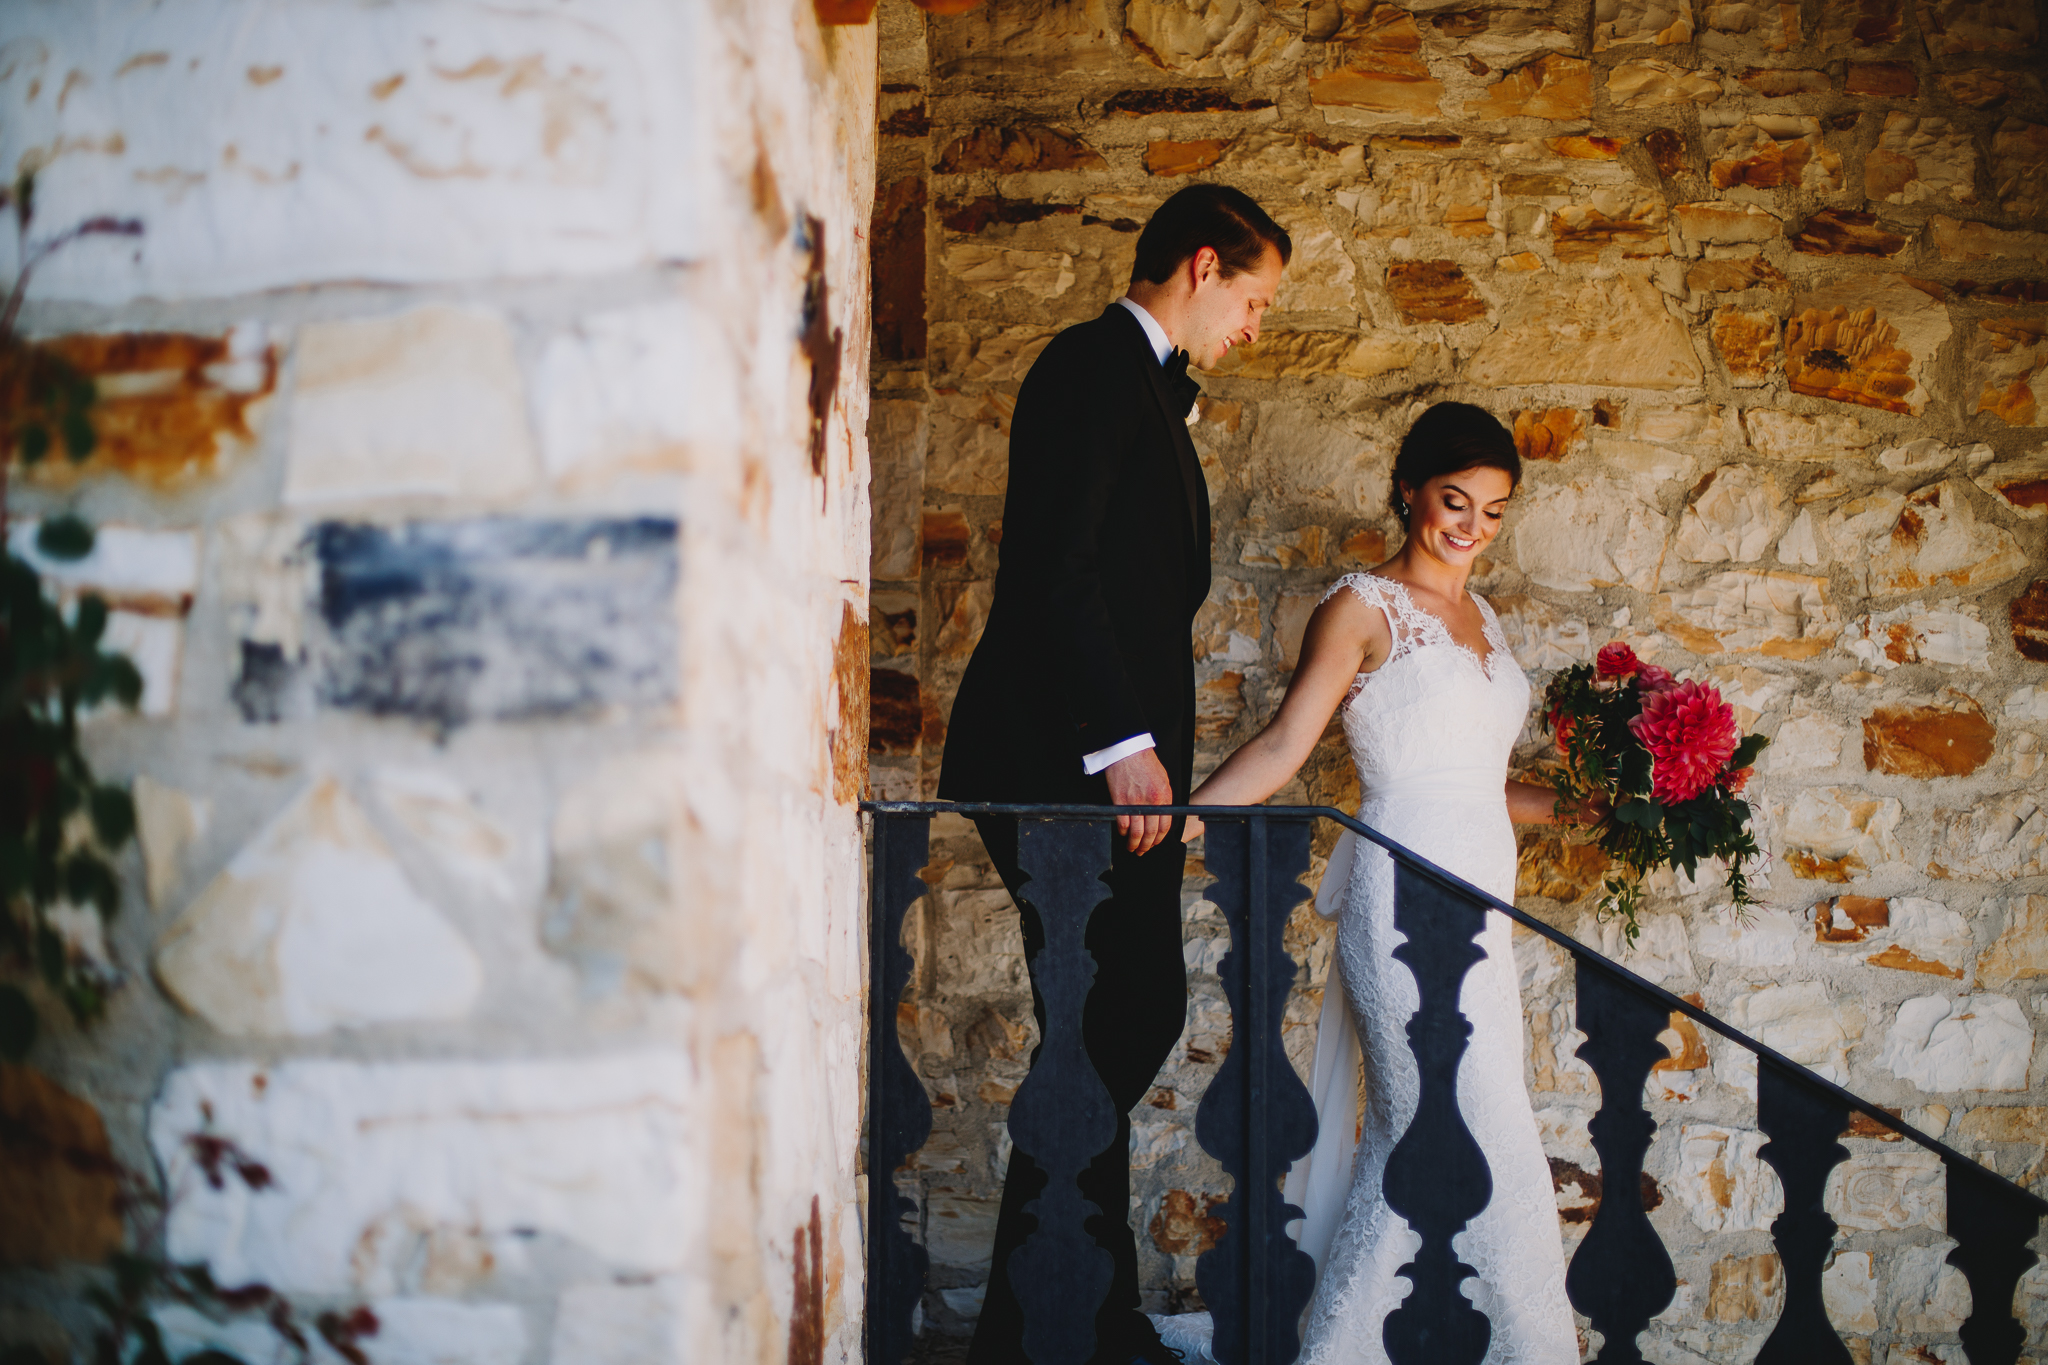 Archer Inspired Photography Carmel California Wedding Lifestyle Documentary Photographer Bride and Groom-5.jpg